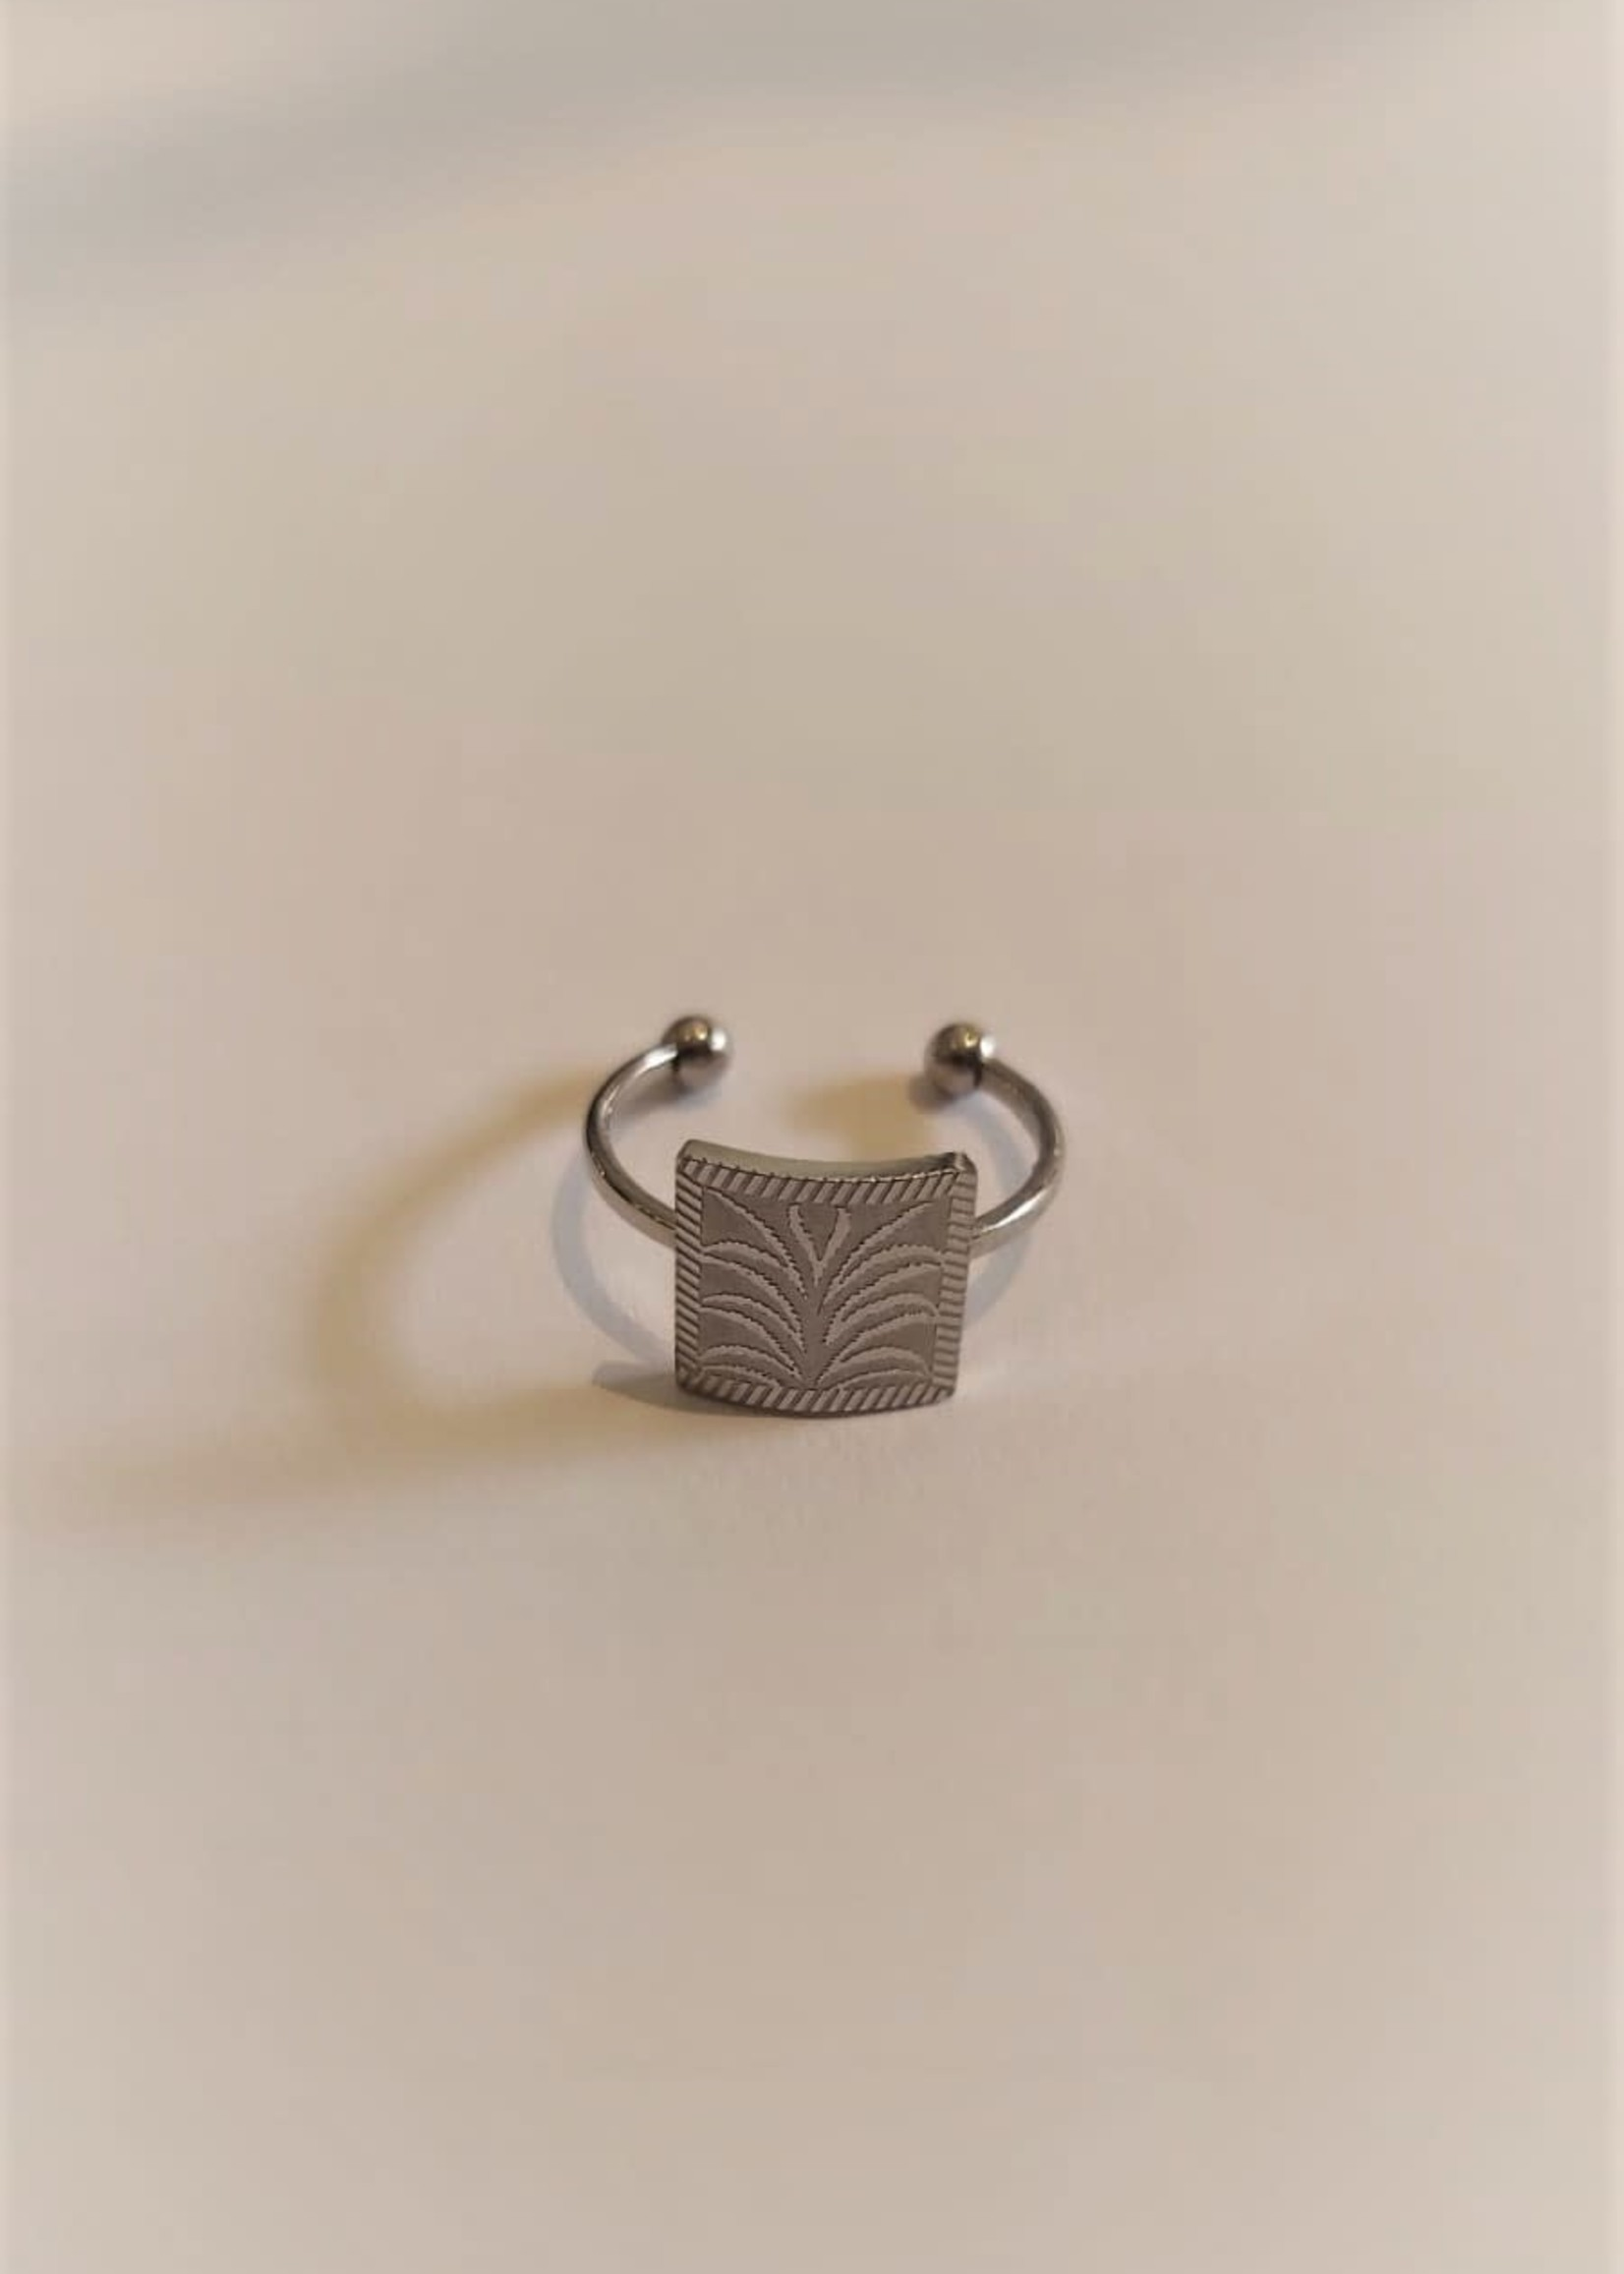 My Jewellery My Jewellery ring plaatje met palmboom